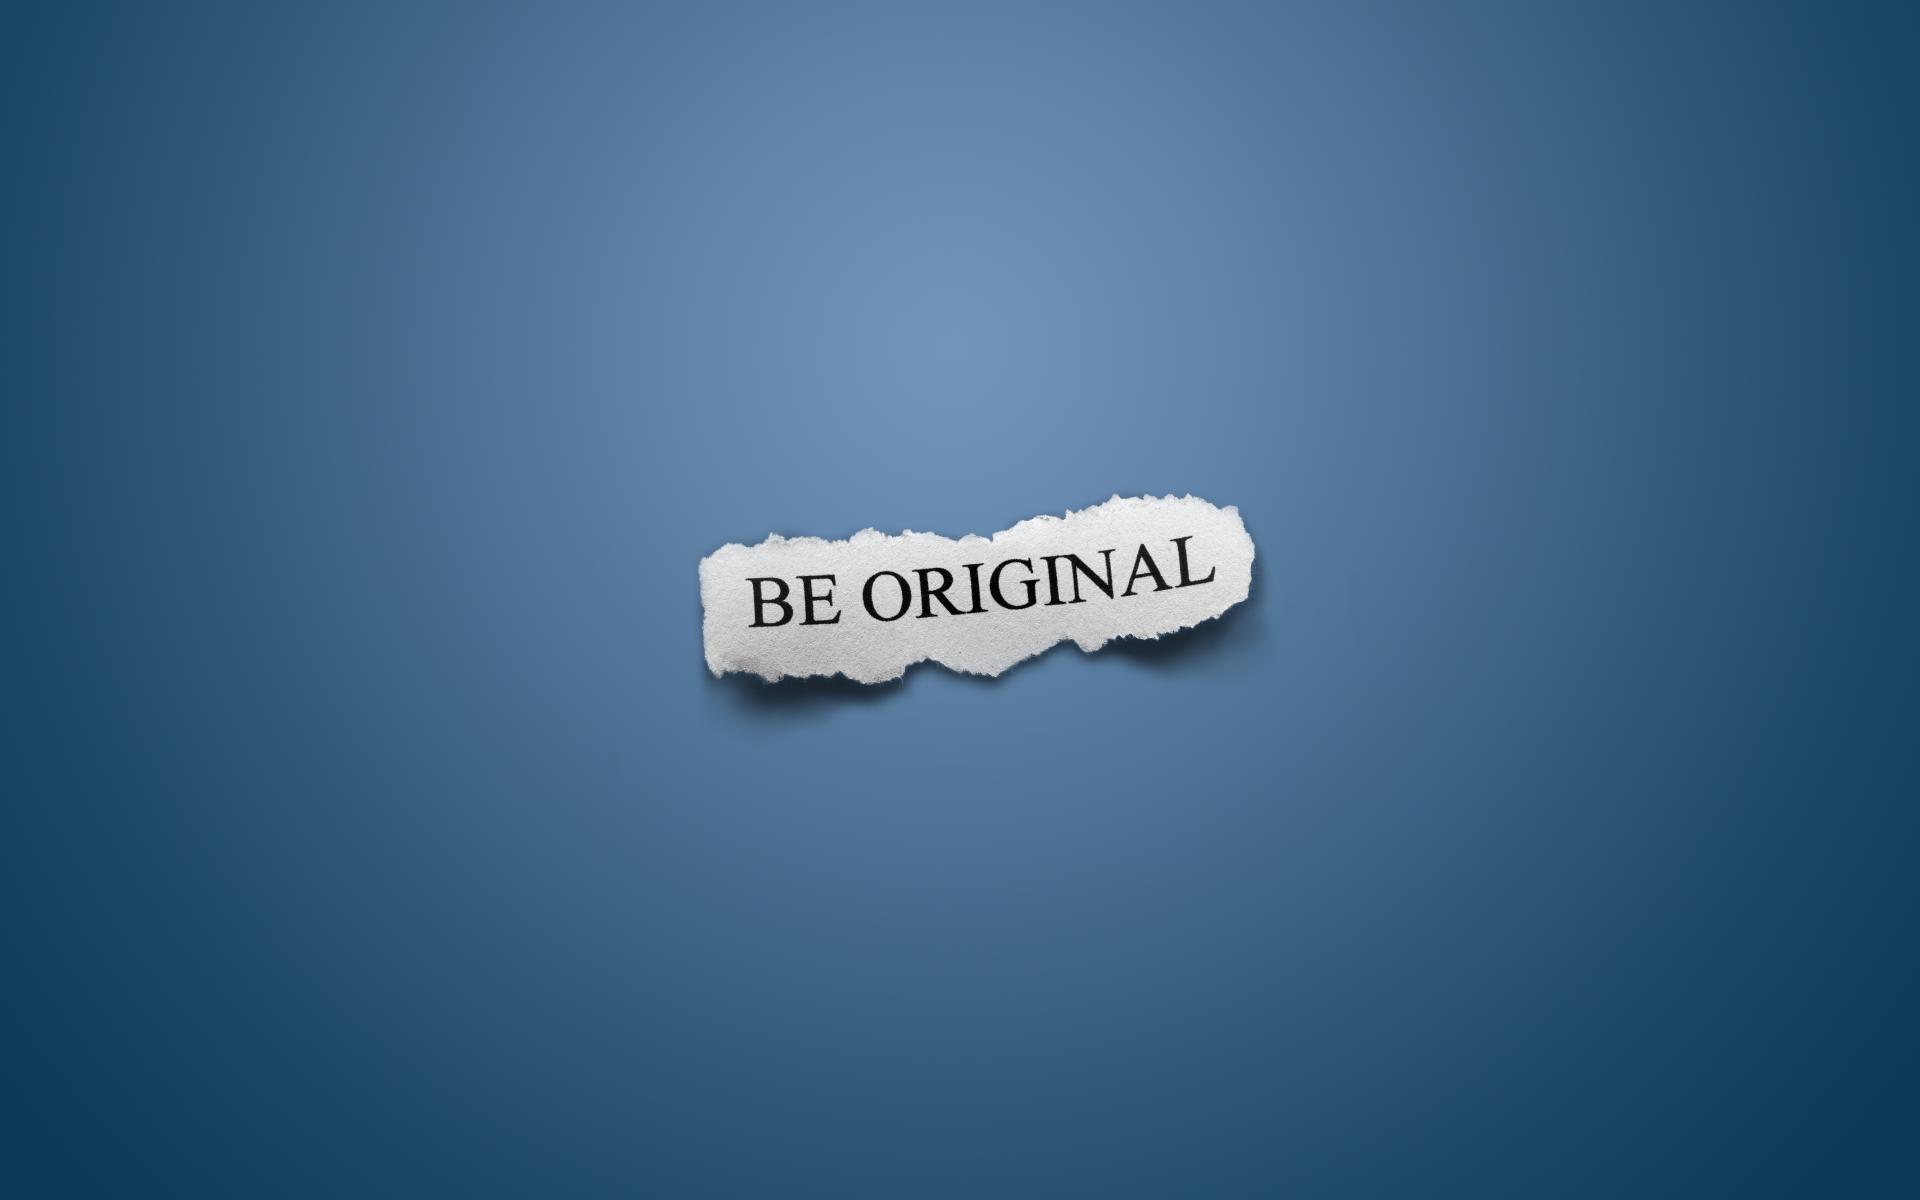 blue minimalistic text motivation advice Motivational   Wallpaper 1920x1200